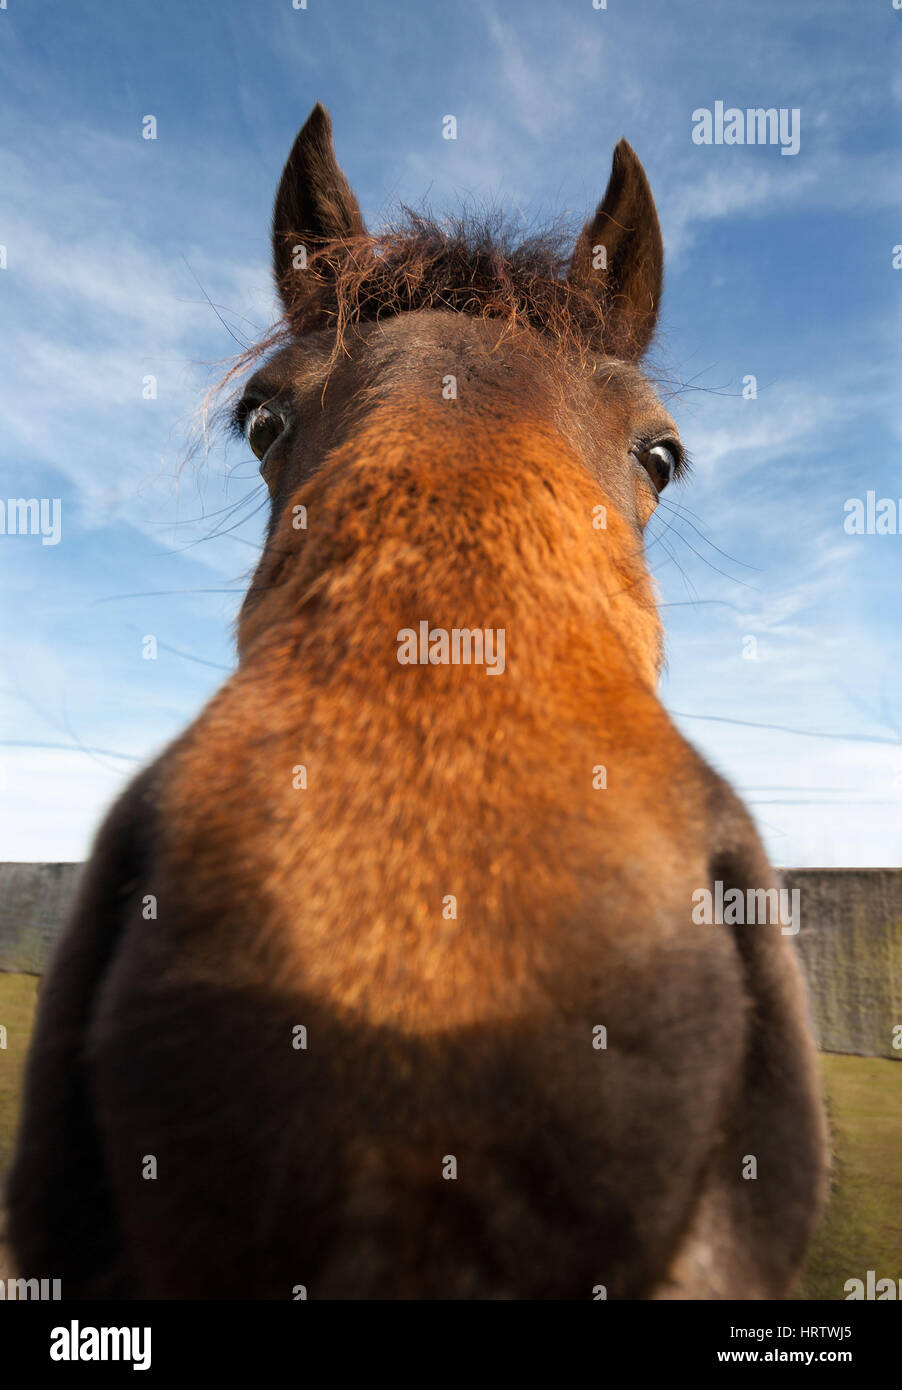 Wild Eyed Funny Horse Closeup Looking At Camera Stock Photo Alamy